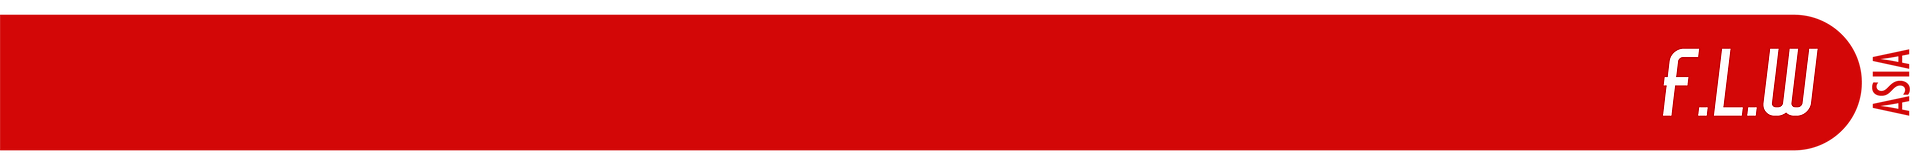 FLW Logos-06.png